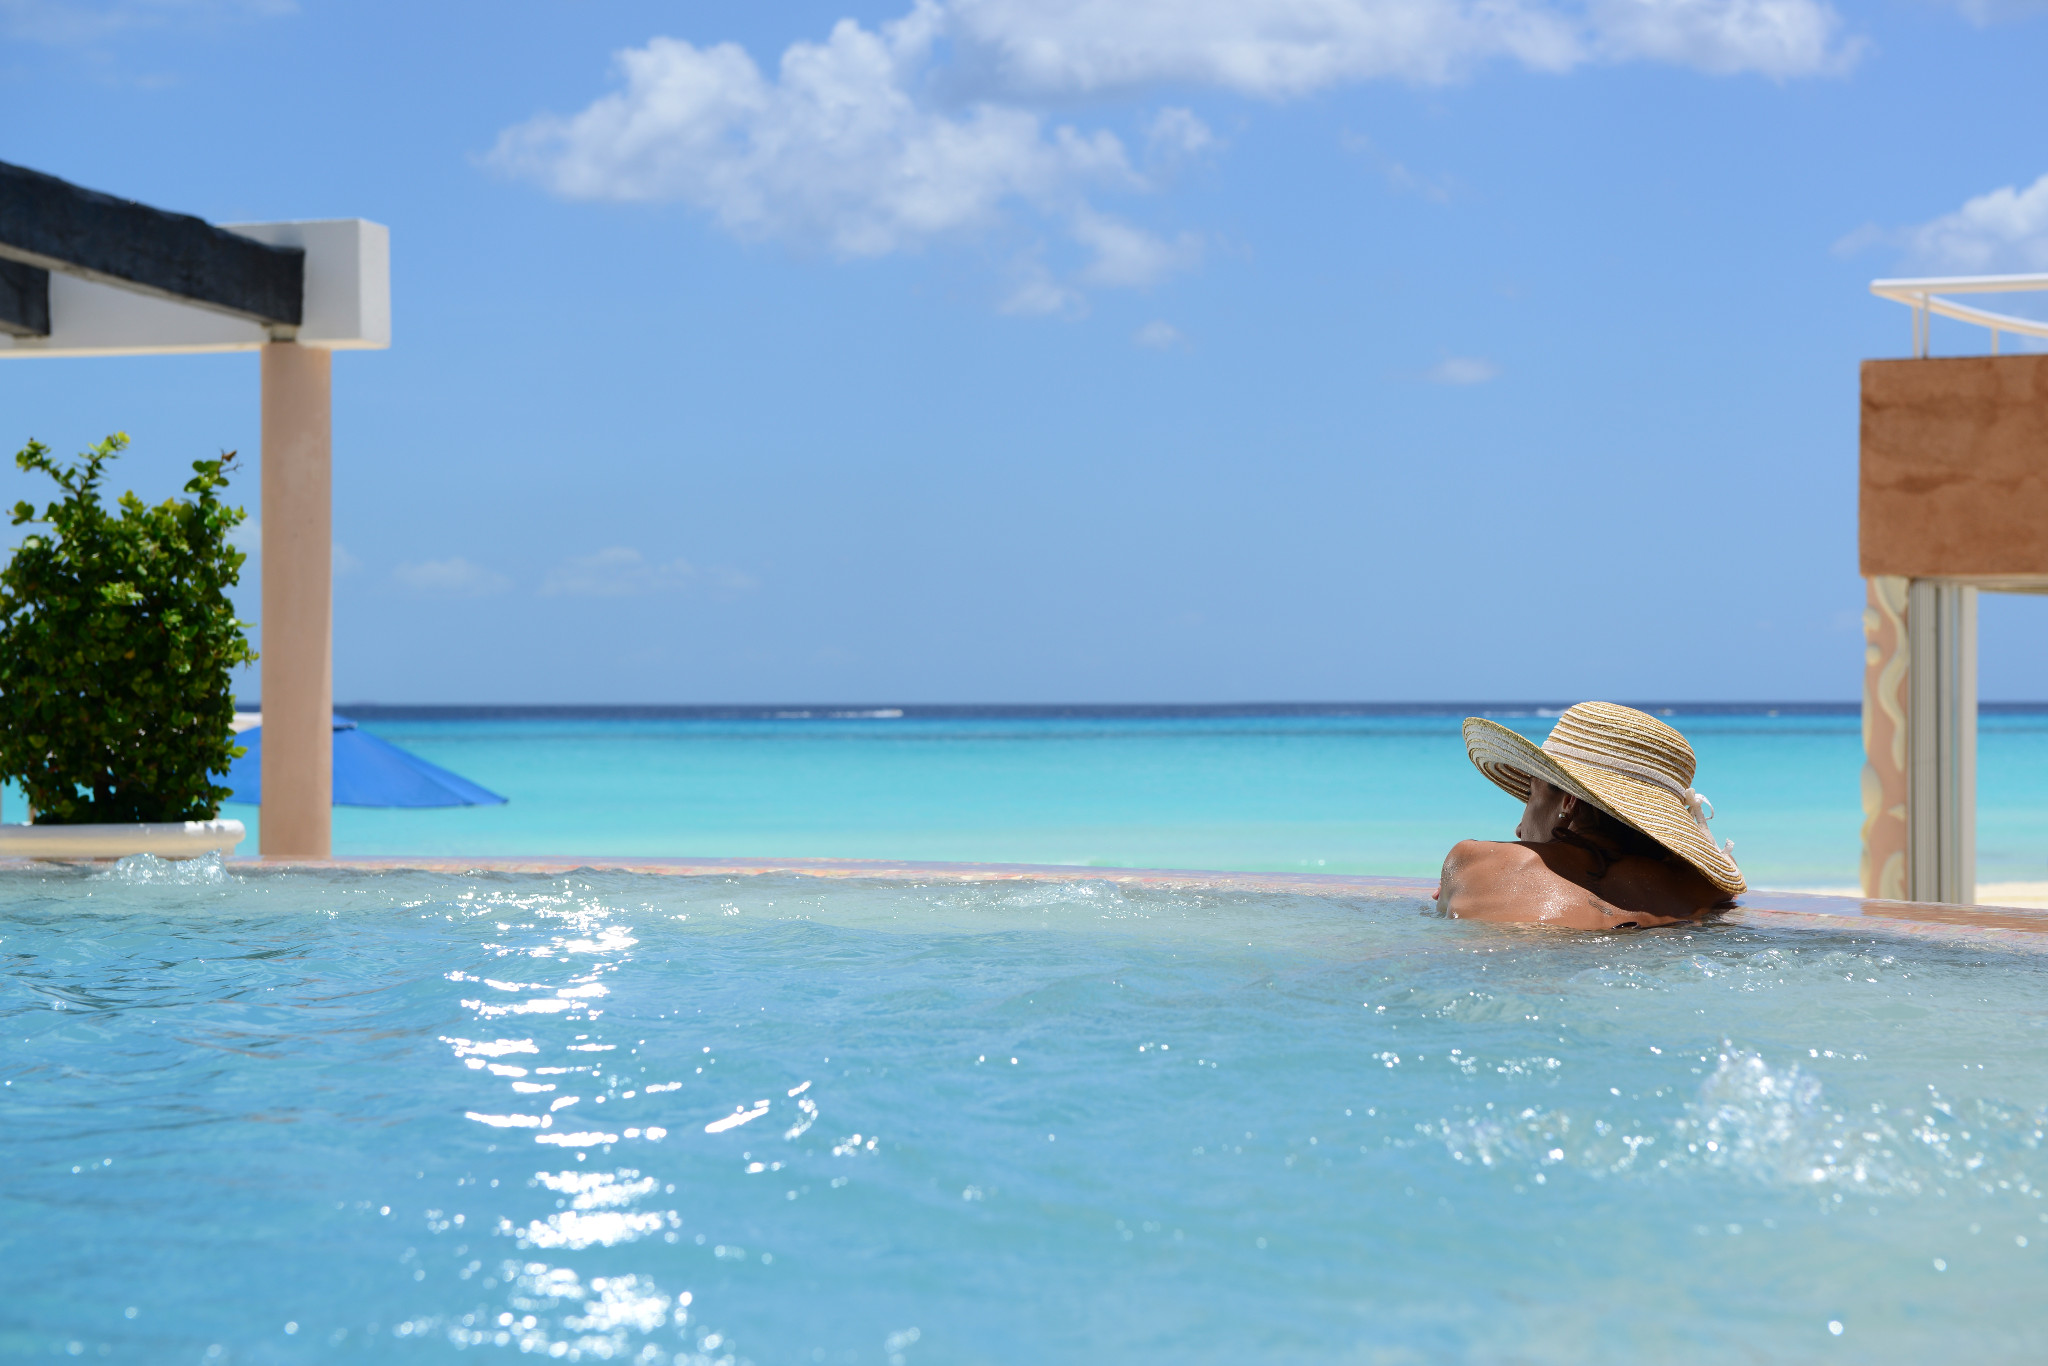 Sunset Fishermen Beach Resort: una estancia exclusiva en Playacar